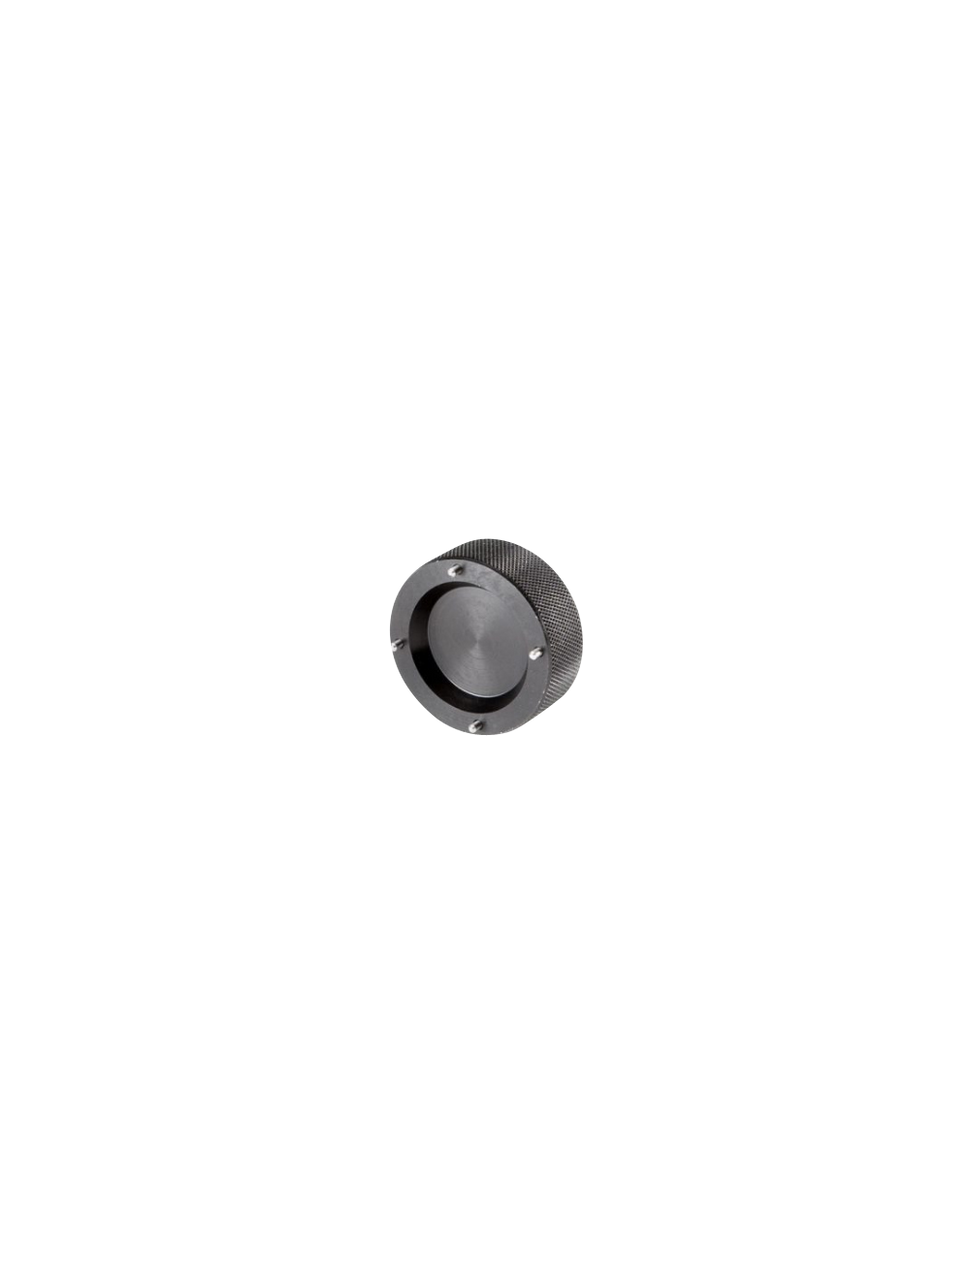 Dead Air Front Cap Tool, Deadair Dm3000     Ghost/mask Front Cap Tool